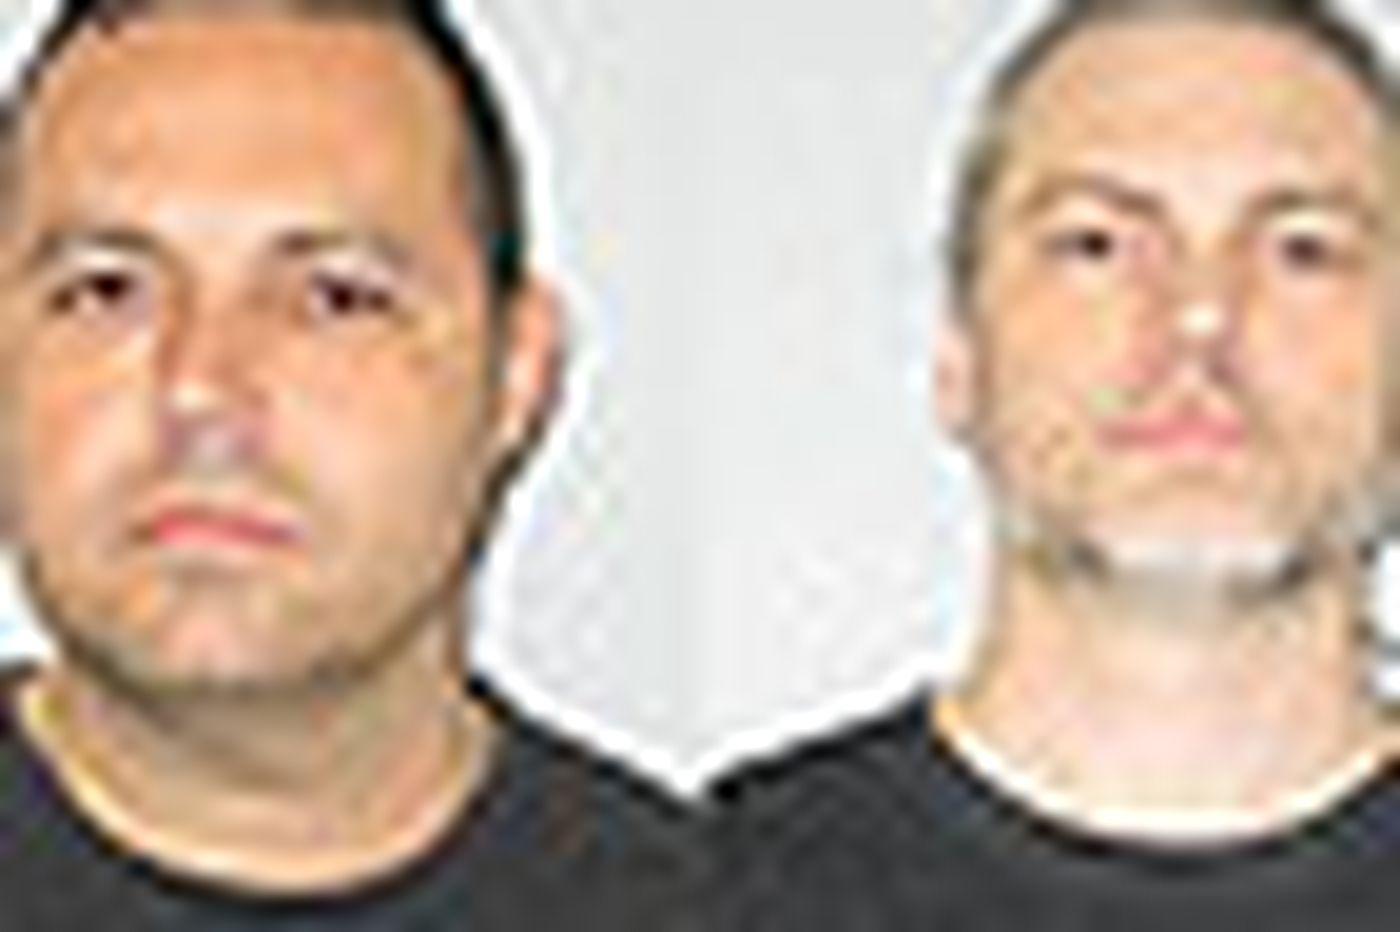 2 jailed in alleged Mount Laurel rape